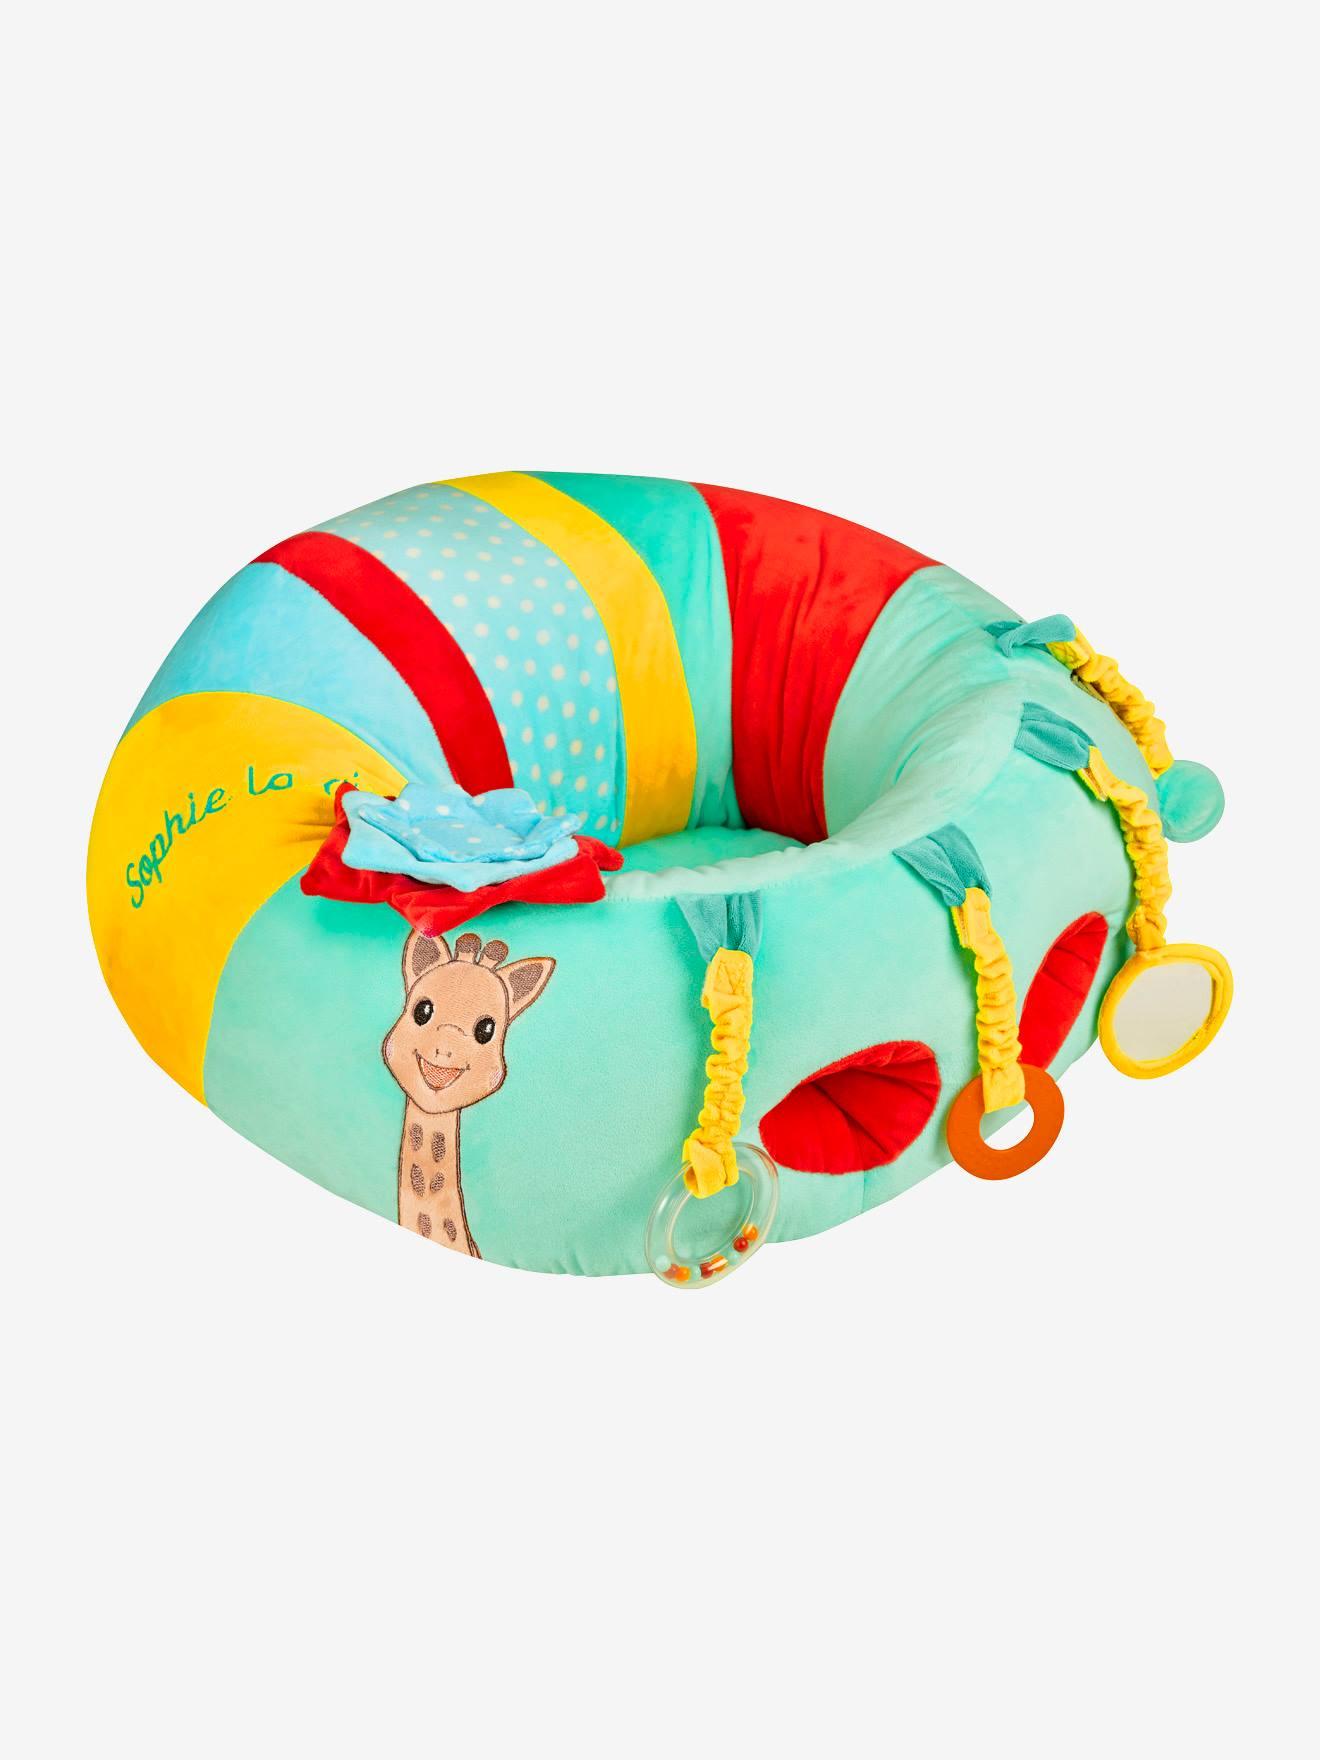 baby seat play sophie la girafe vulli bleu